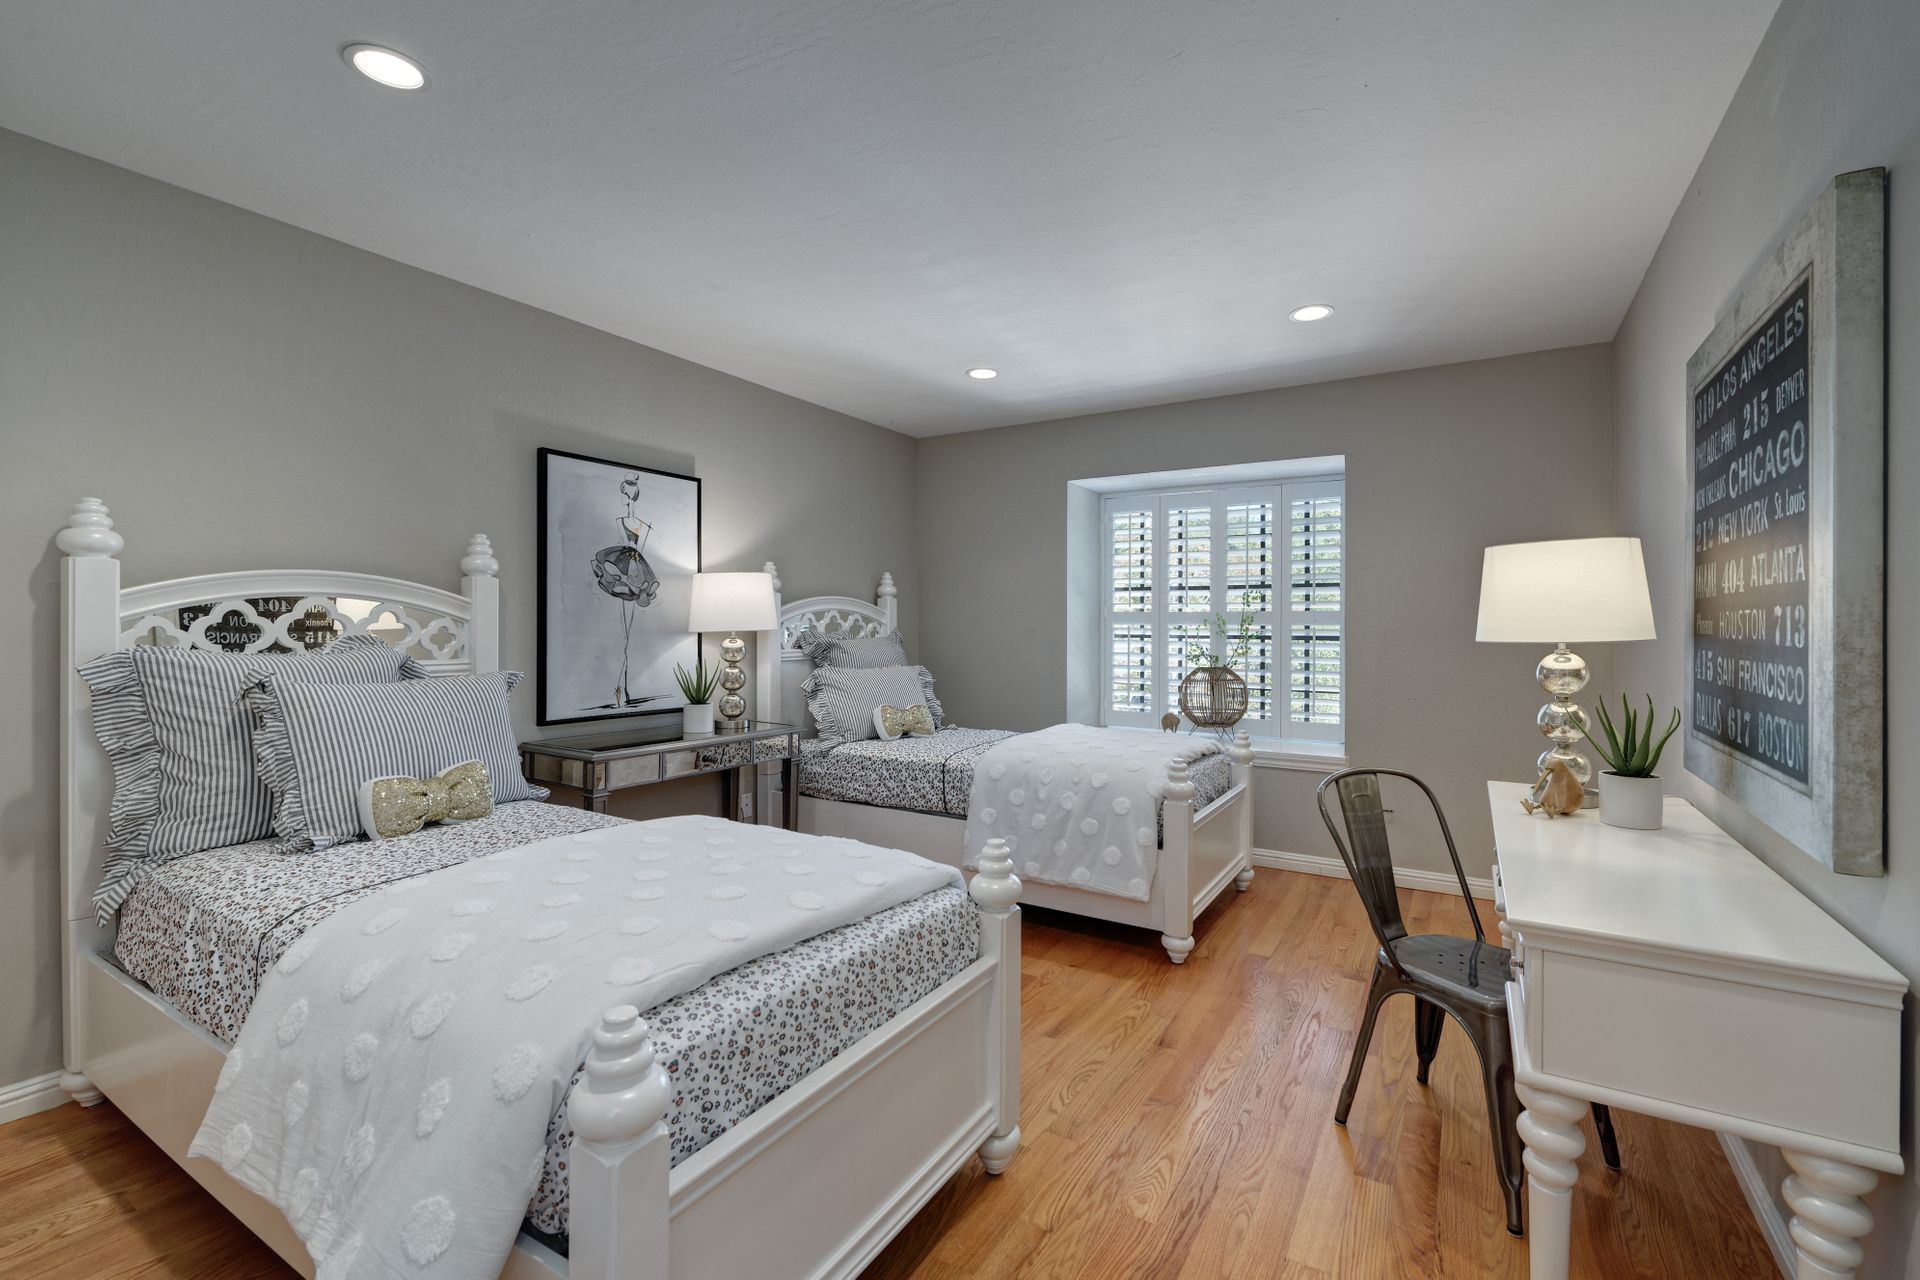 17_Bedroom.jpg